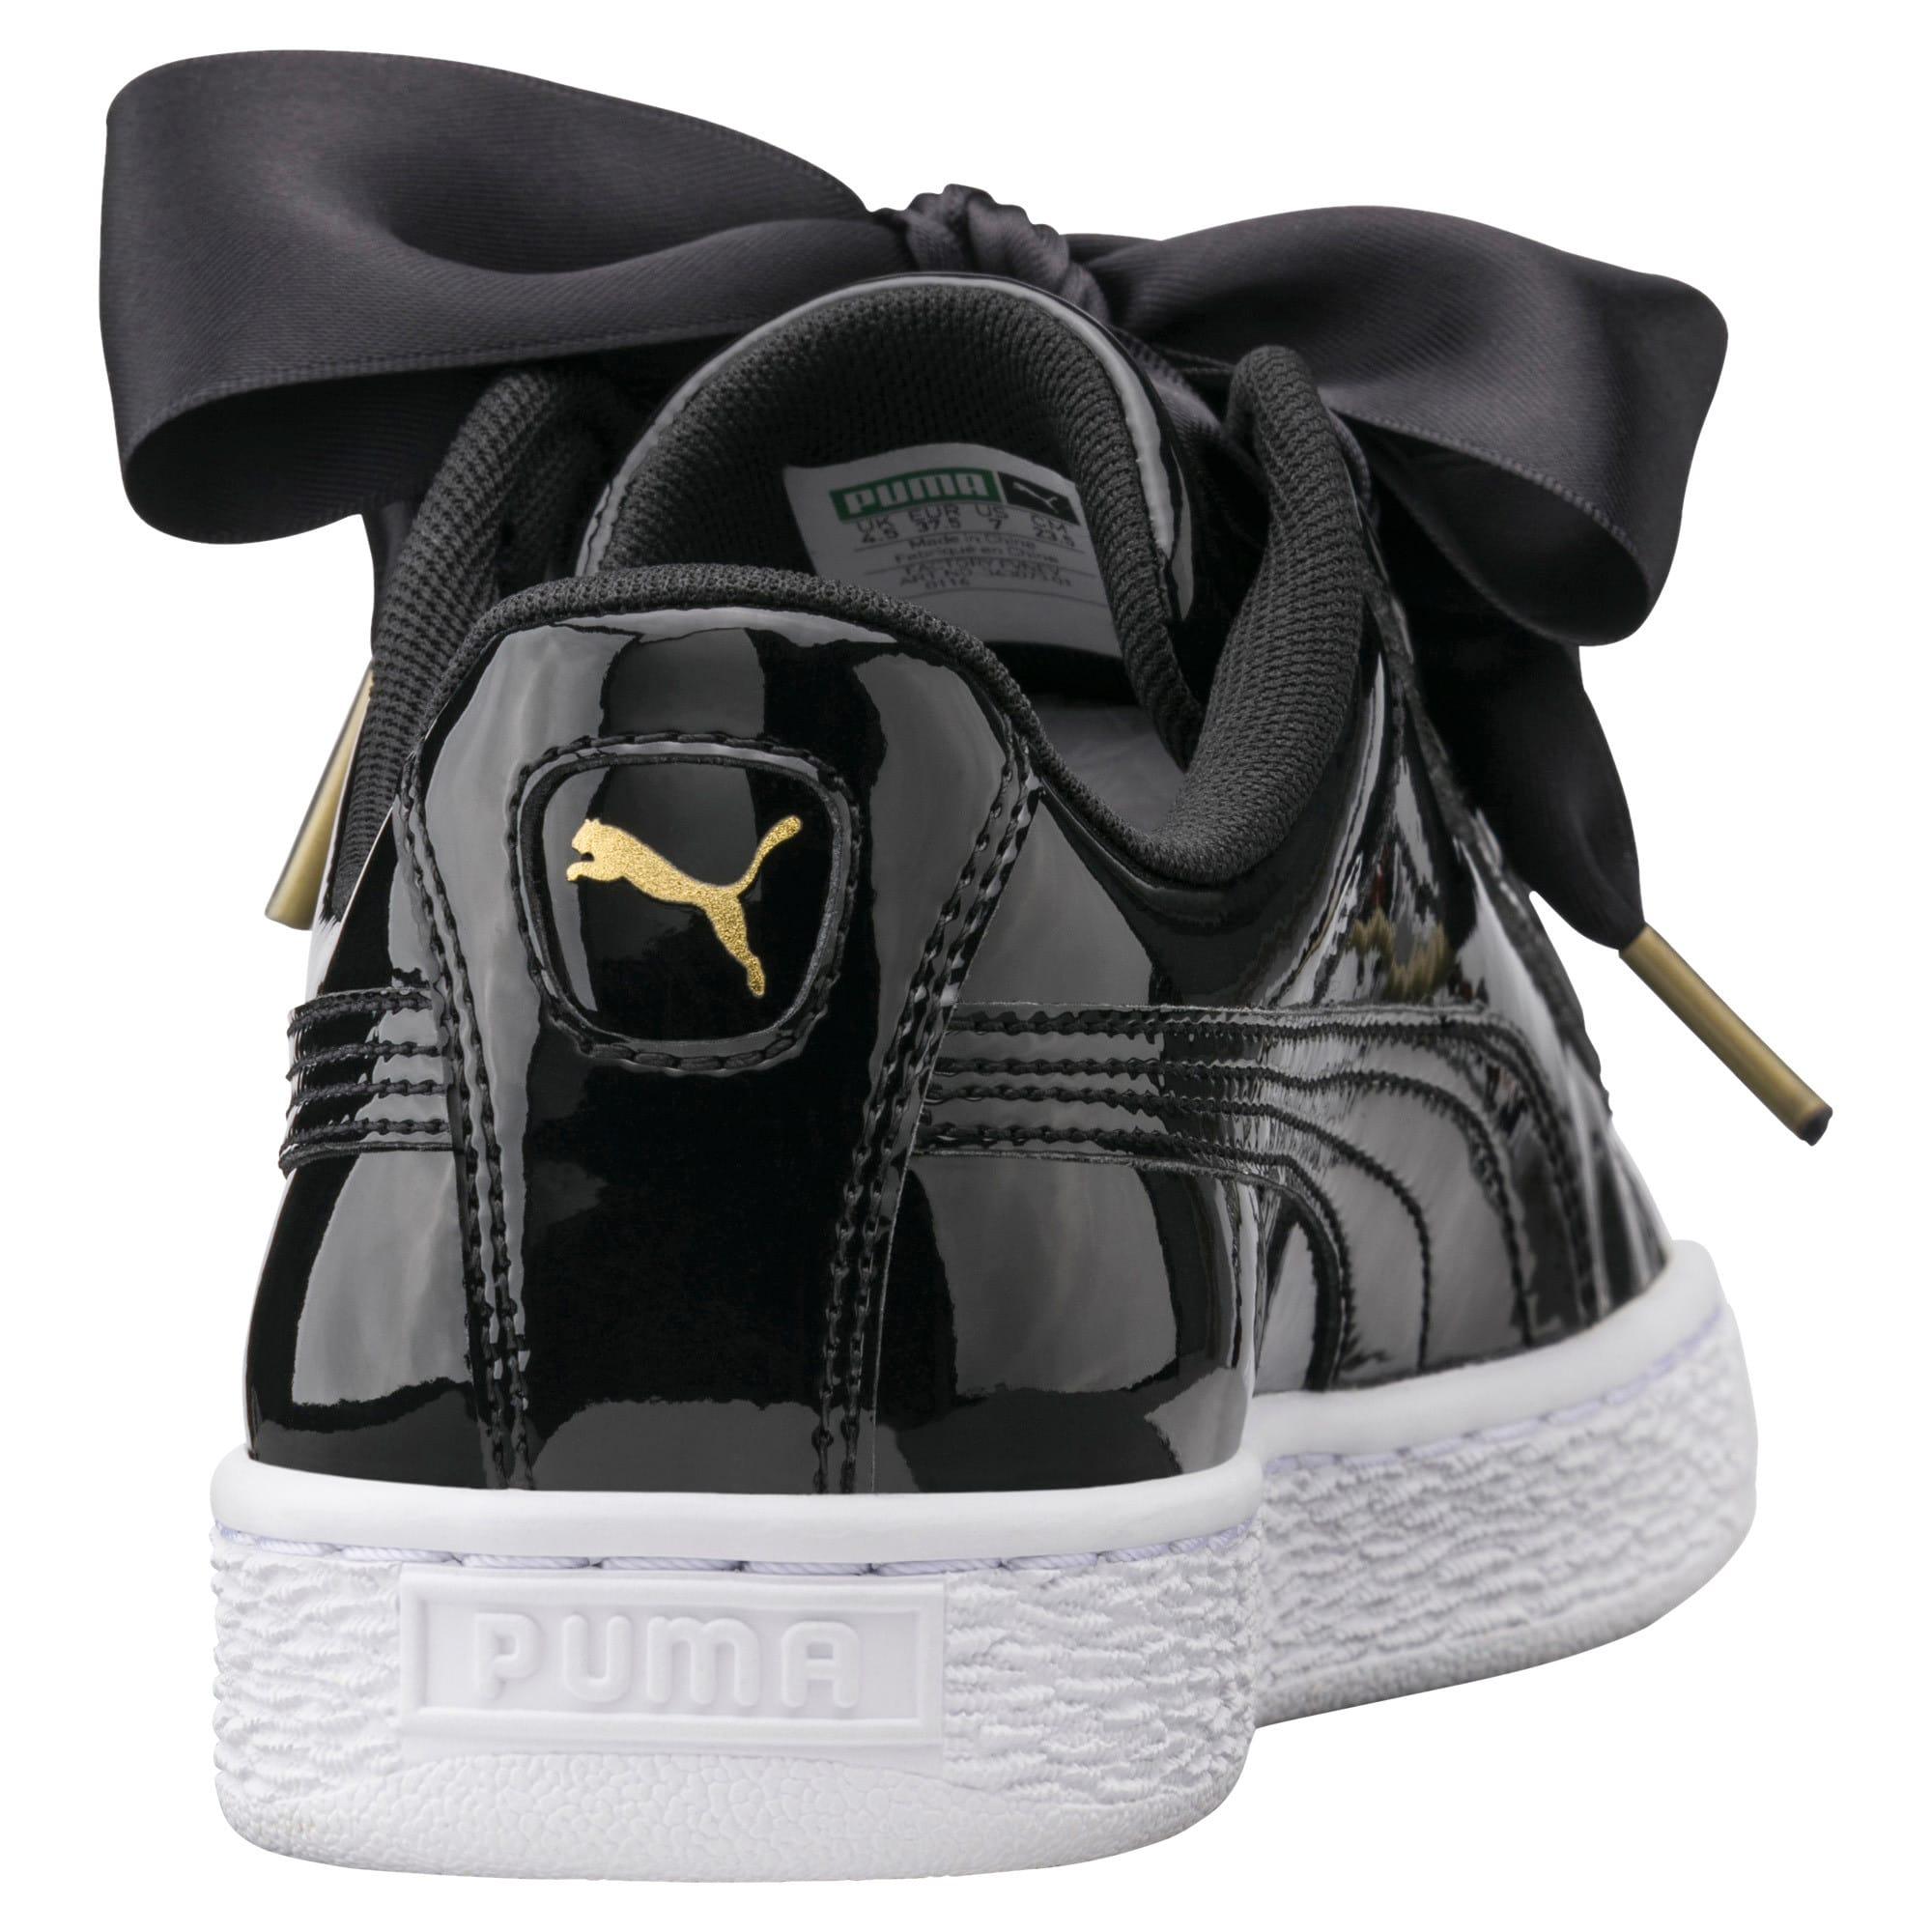 Thumbnail 3 of Basket Heart Patent Women's Trainers, Puma Black-Puma Black, medium-IND